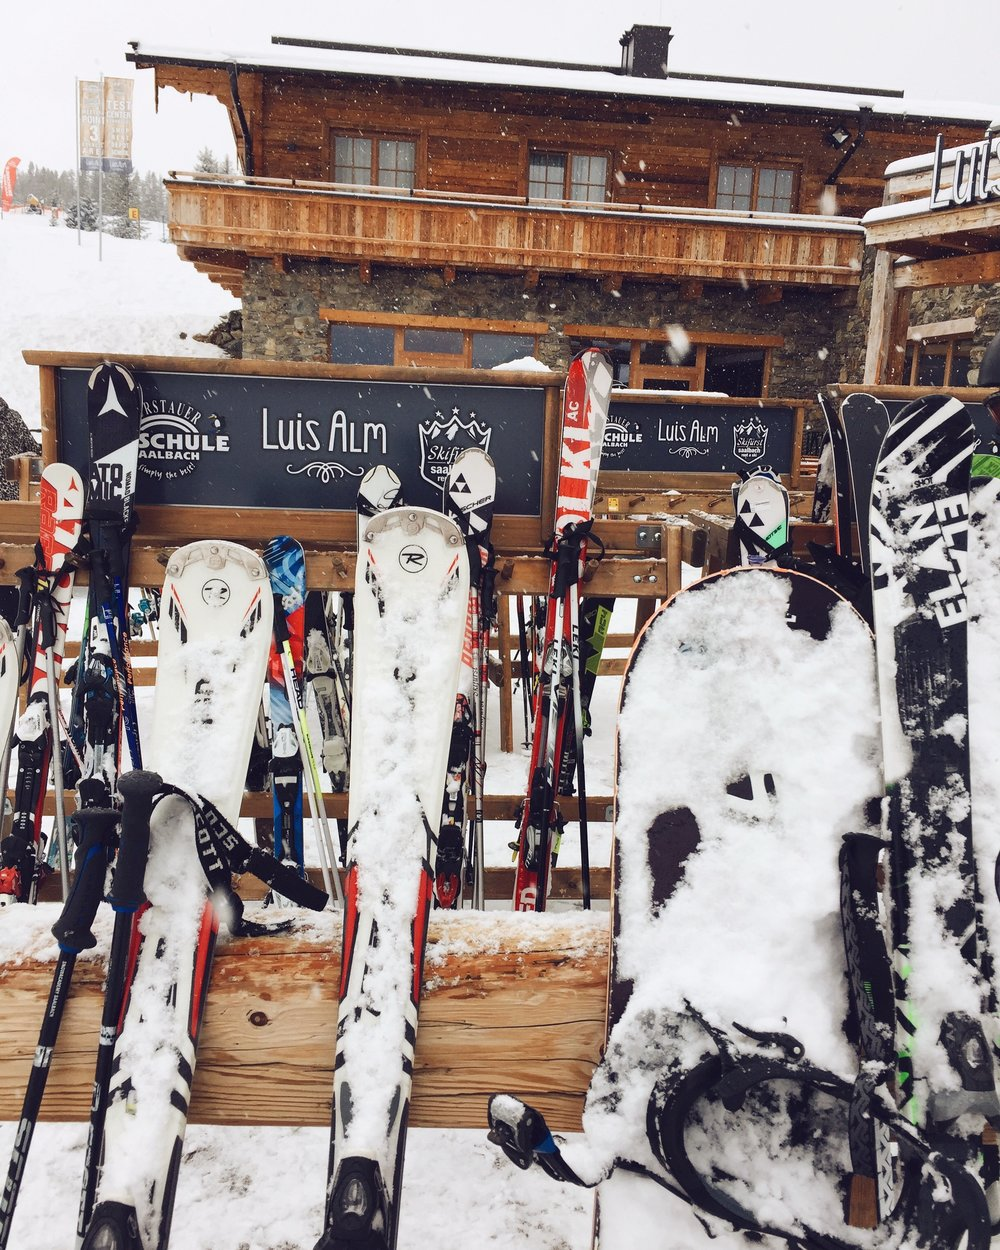 Skiing in Saalbach Hinterglemm